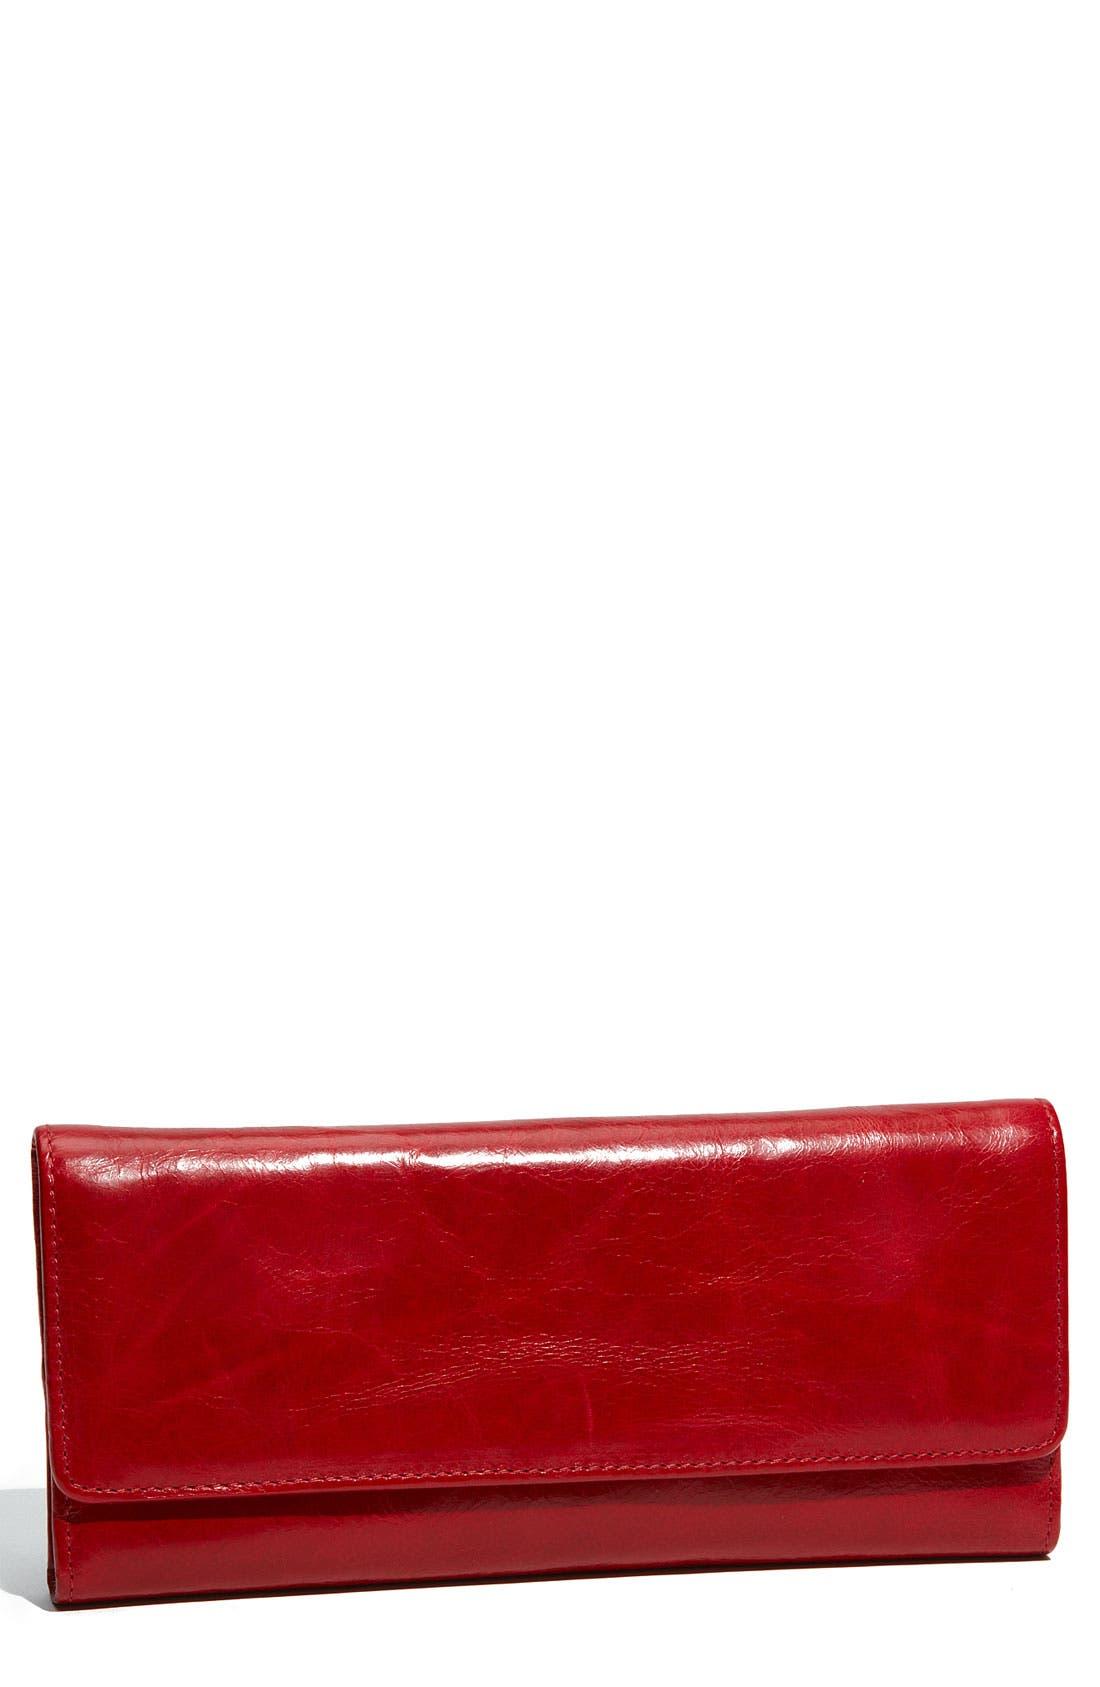 'Sadie' Leather Wallet,                             Main thumbnail 53, color,